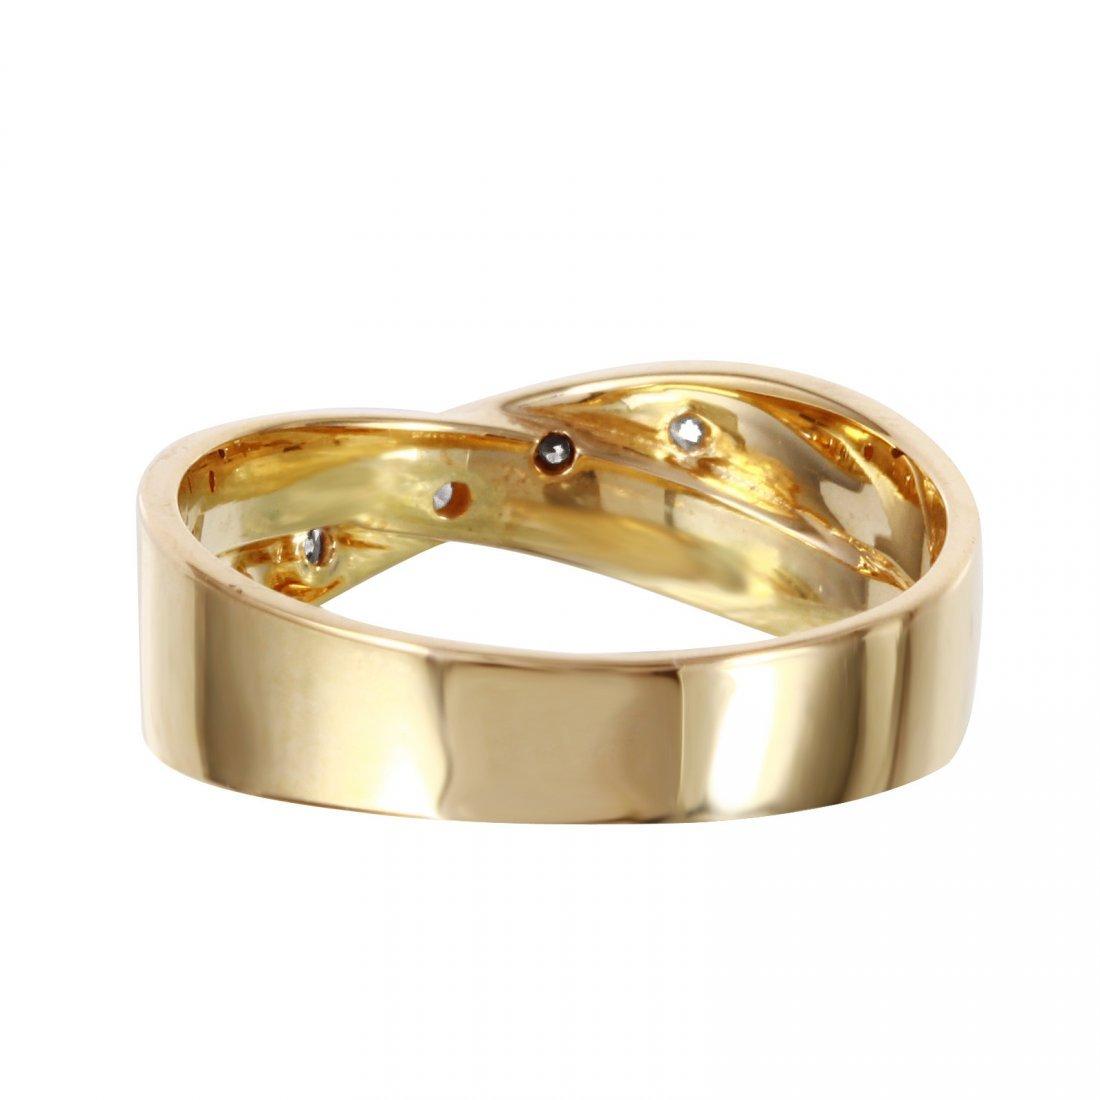 14K Yellow Gold Diamond Crossover Ring, 0.10 ctw - 3